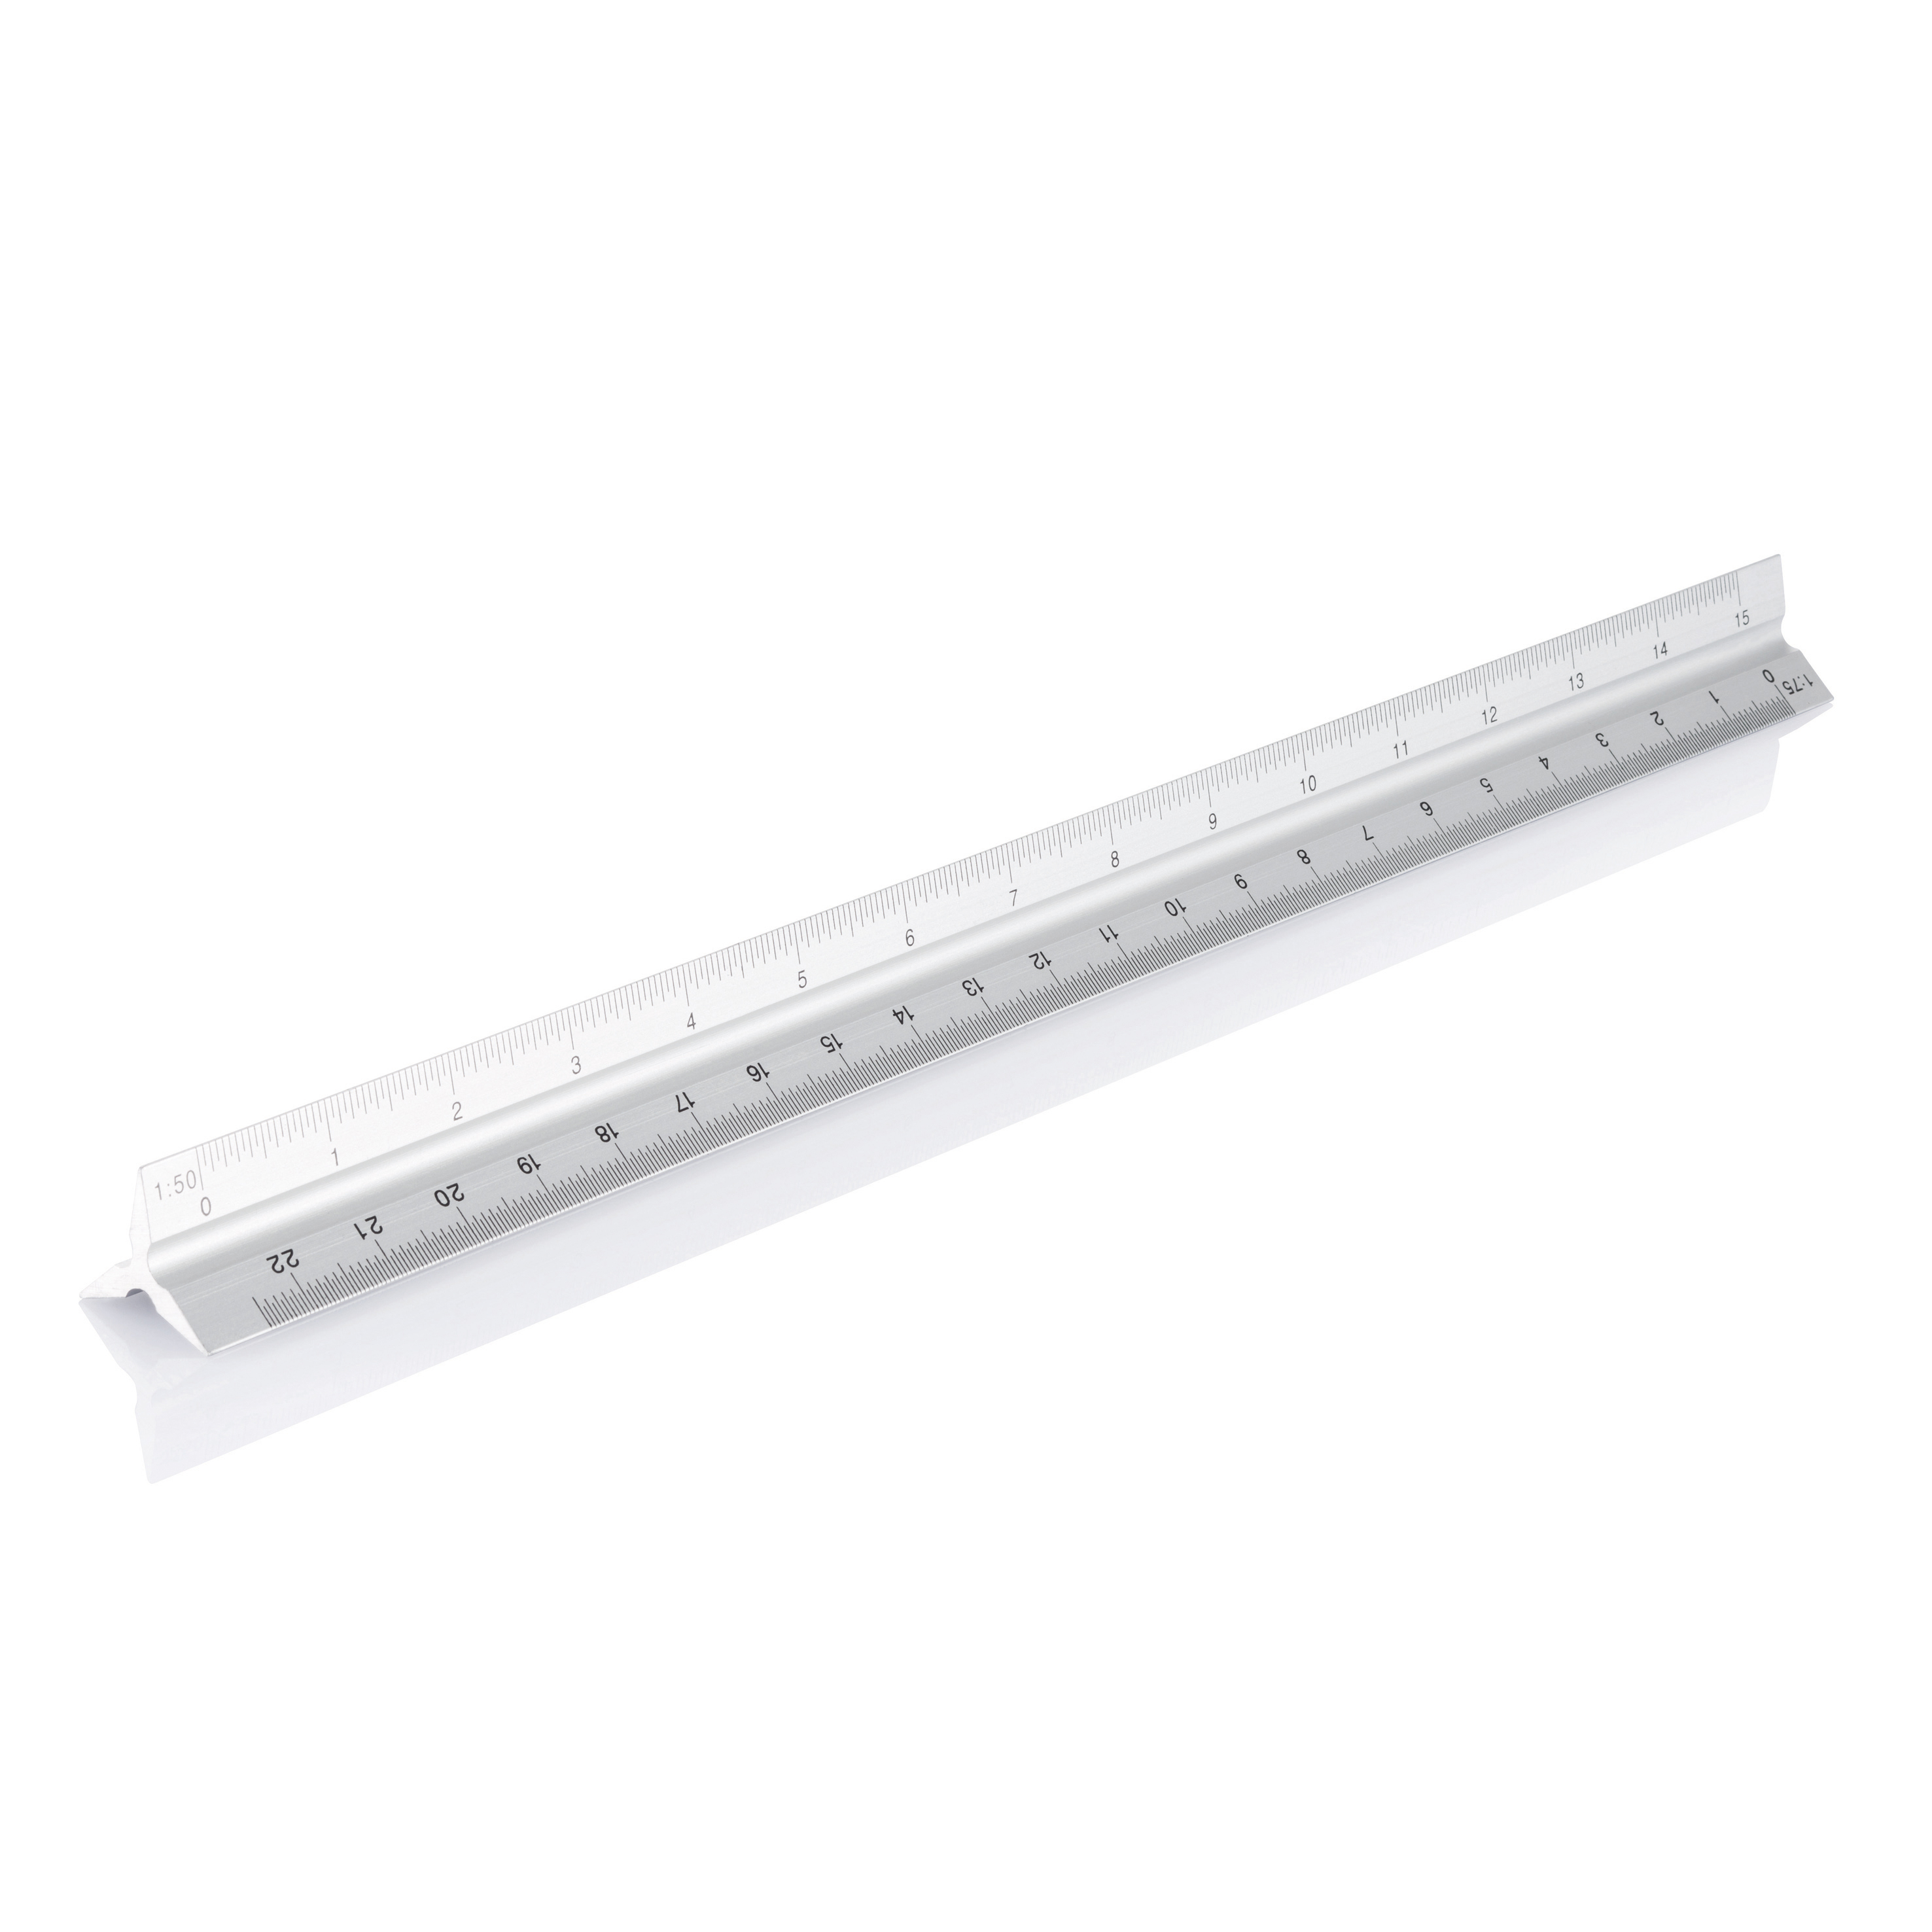 Promotional Aluminium triangle rule - 30cm, silver